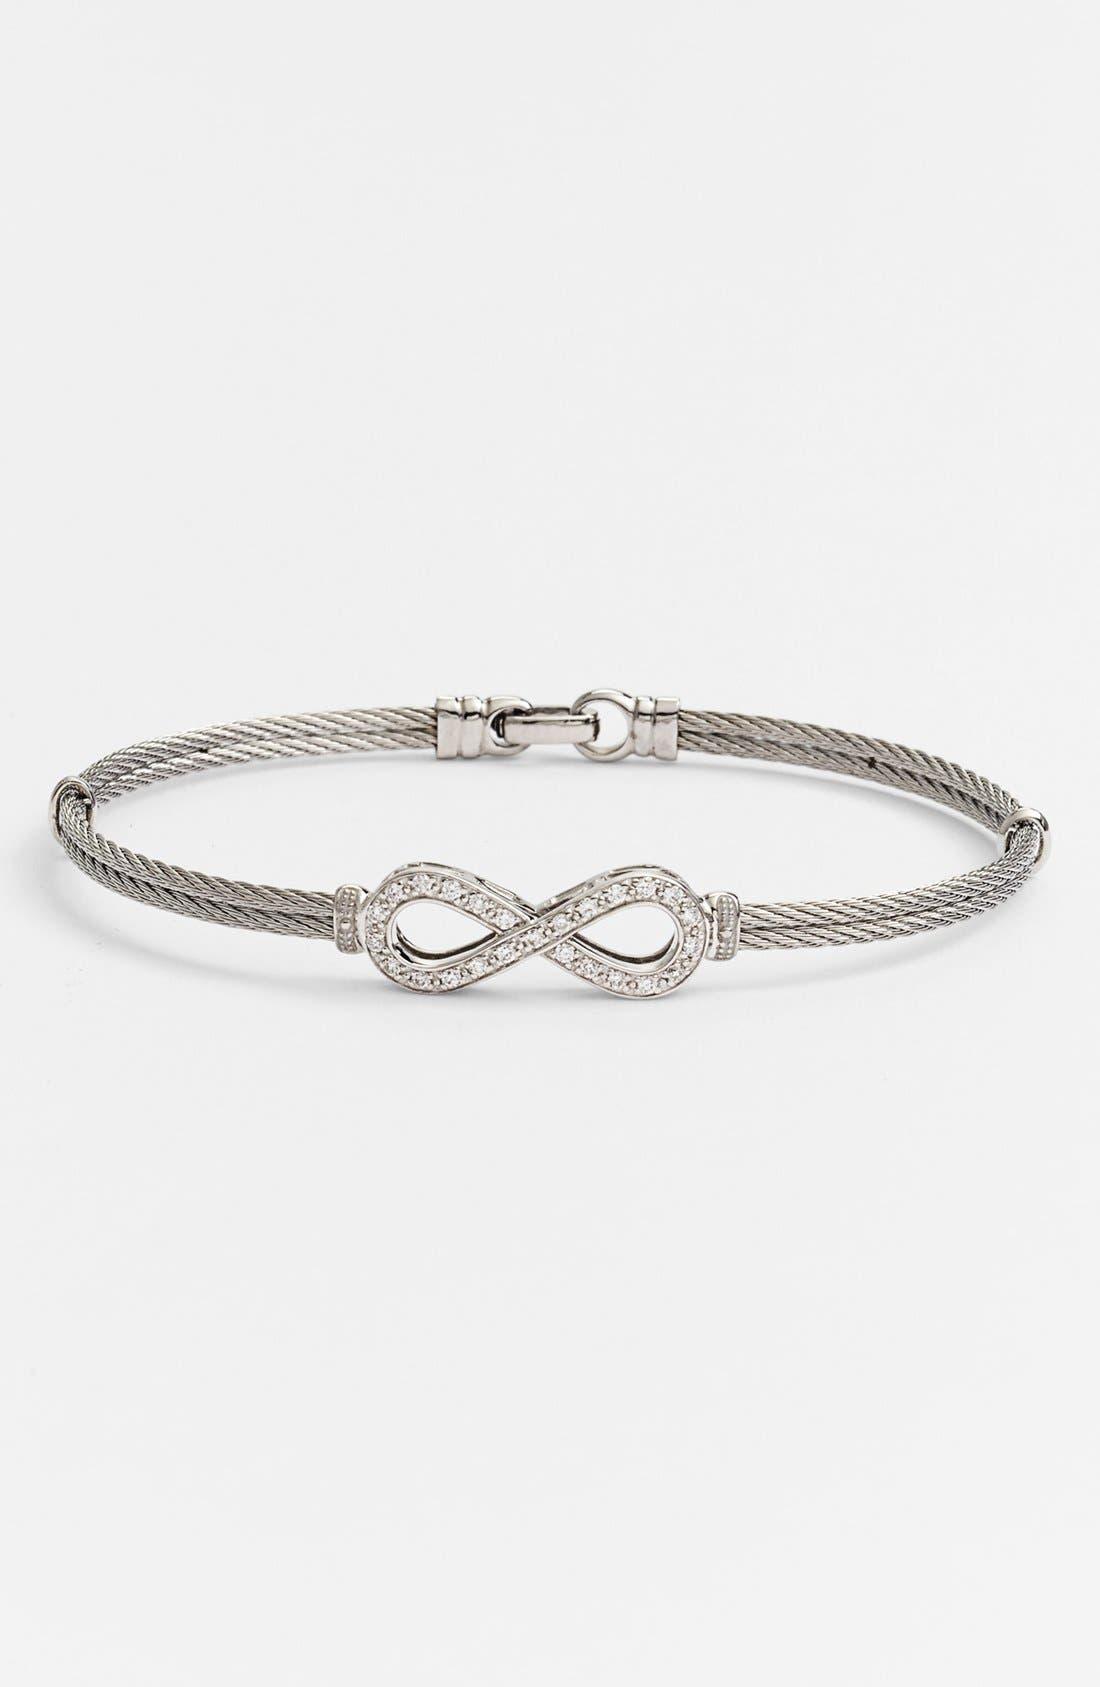 Main Image - ALOR® Infinity Symbol Station Bracelet